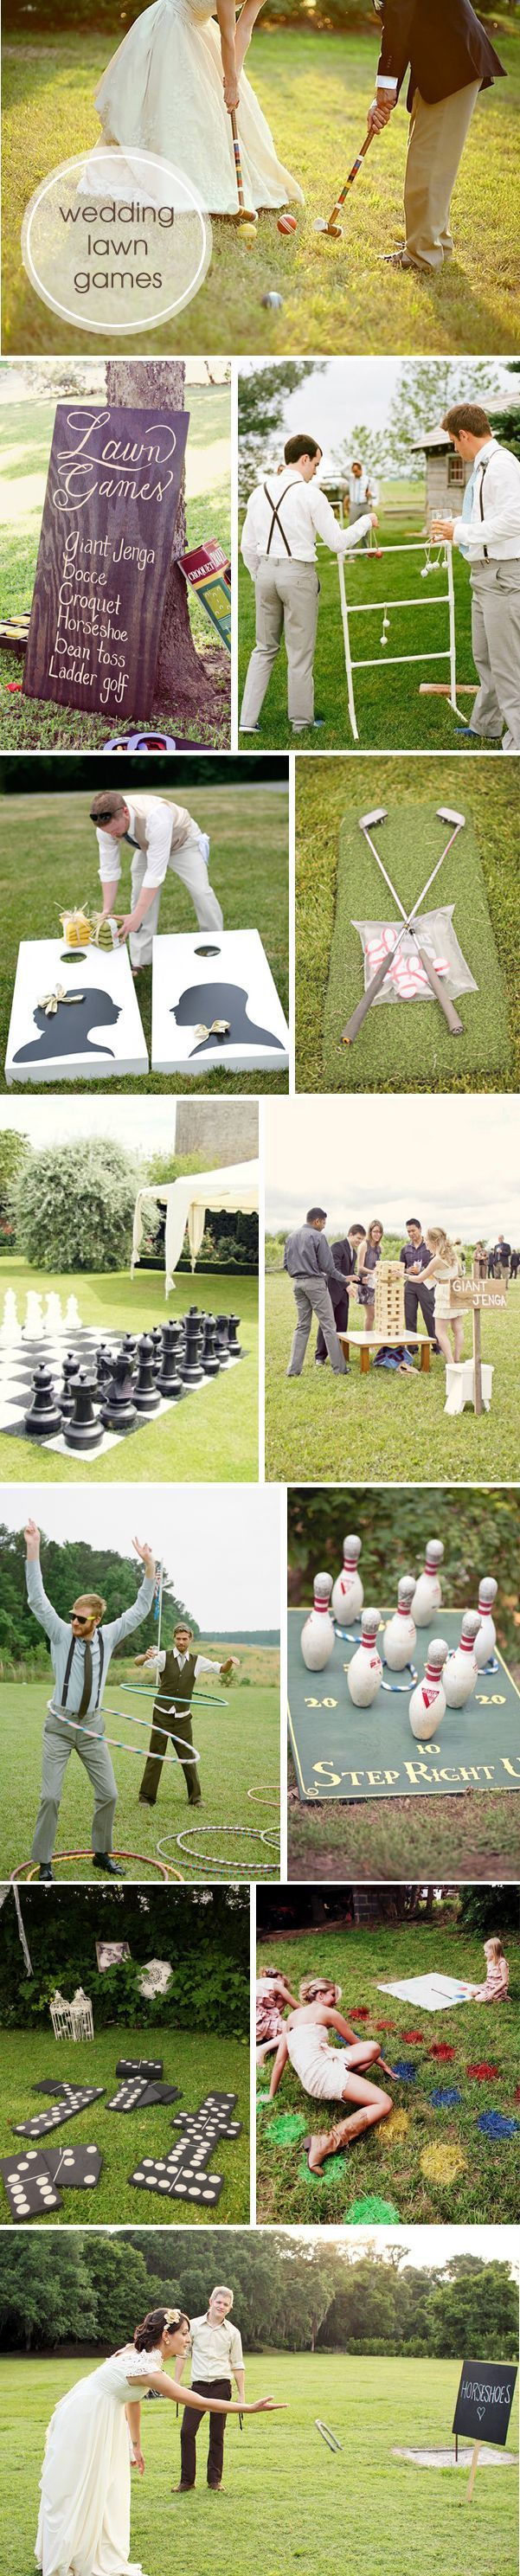 diy outdoor wedding best photos - outdoor wedding - cuteweddingideas.com